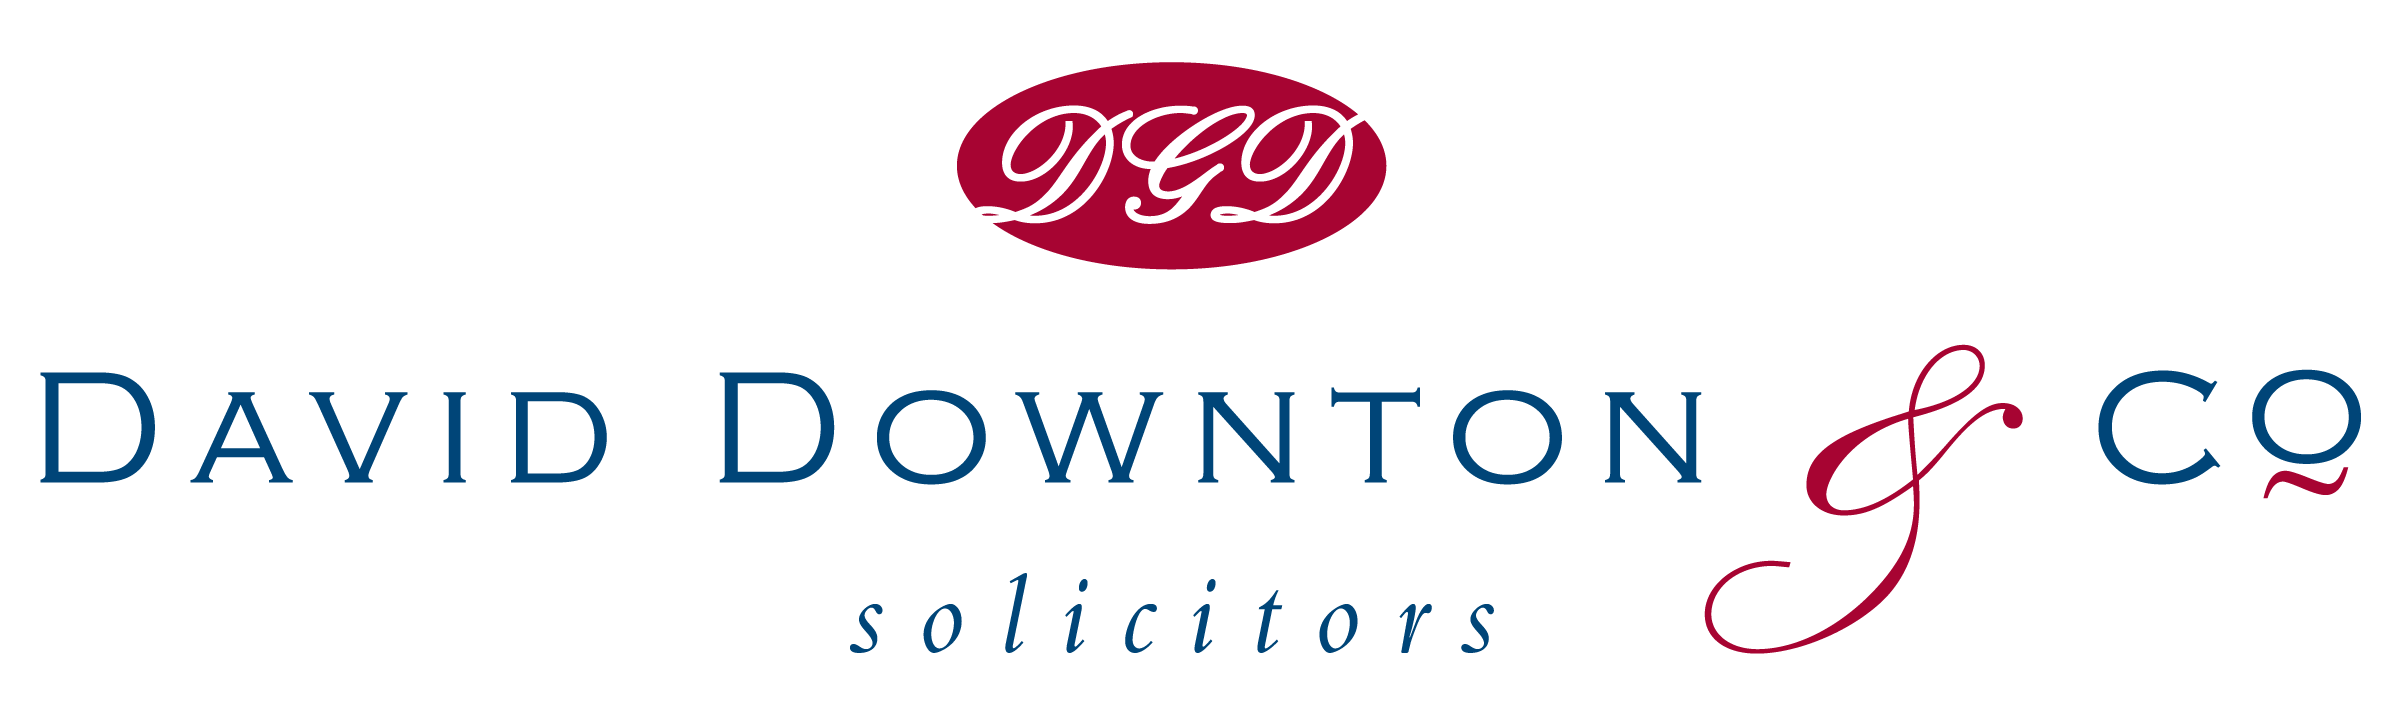 dgd-logo